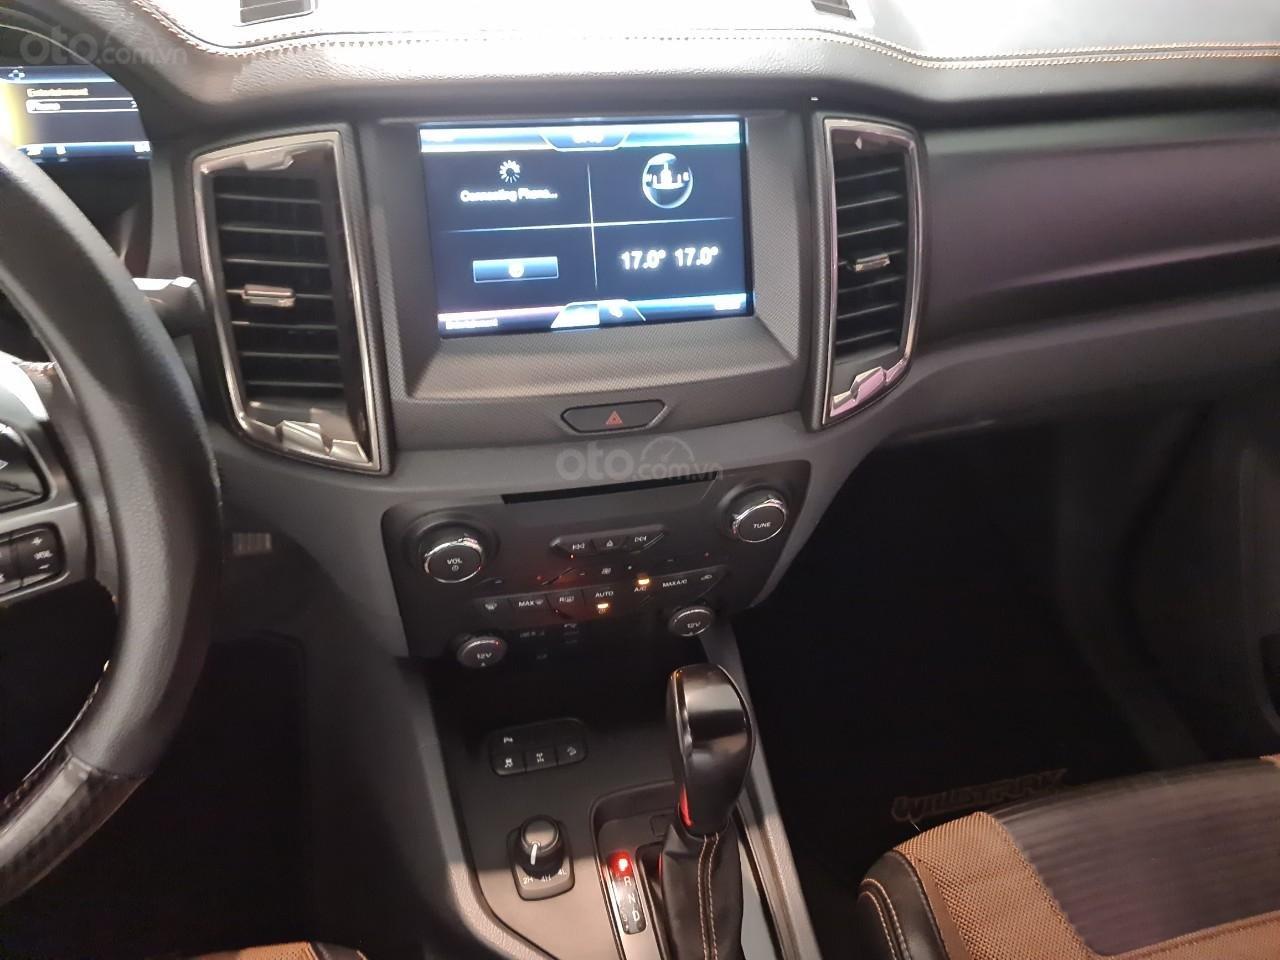 Xe Ford Ranger Wildtrak 3.2L Trắng 2015 Đk 2016 (5)